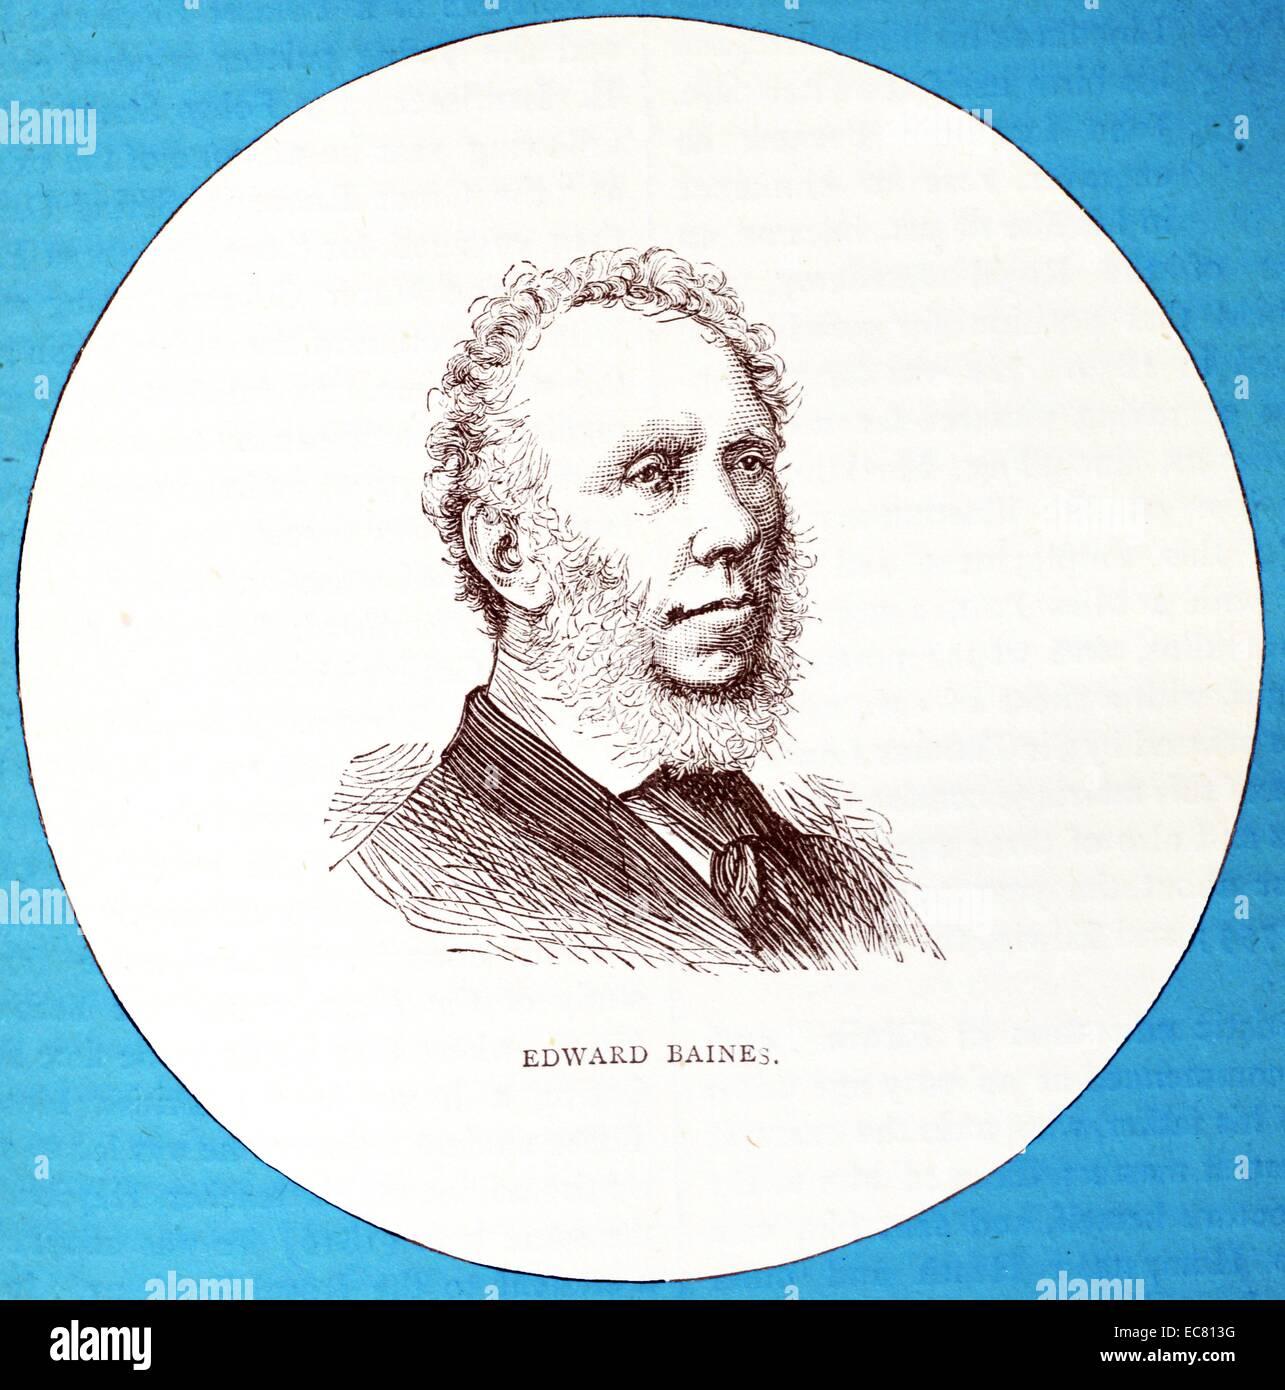 Edward Baines (1800–1890), Nonconformist English Newspaper